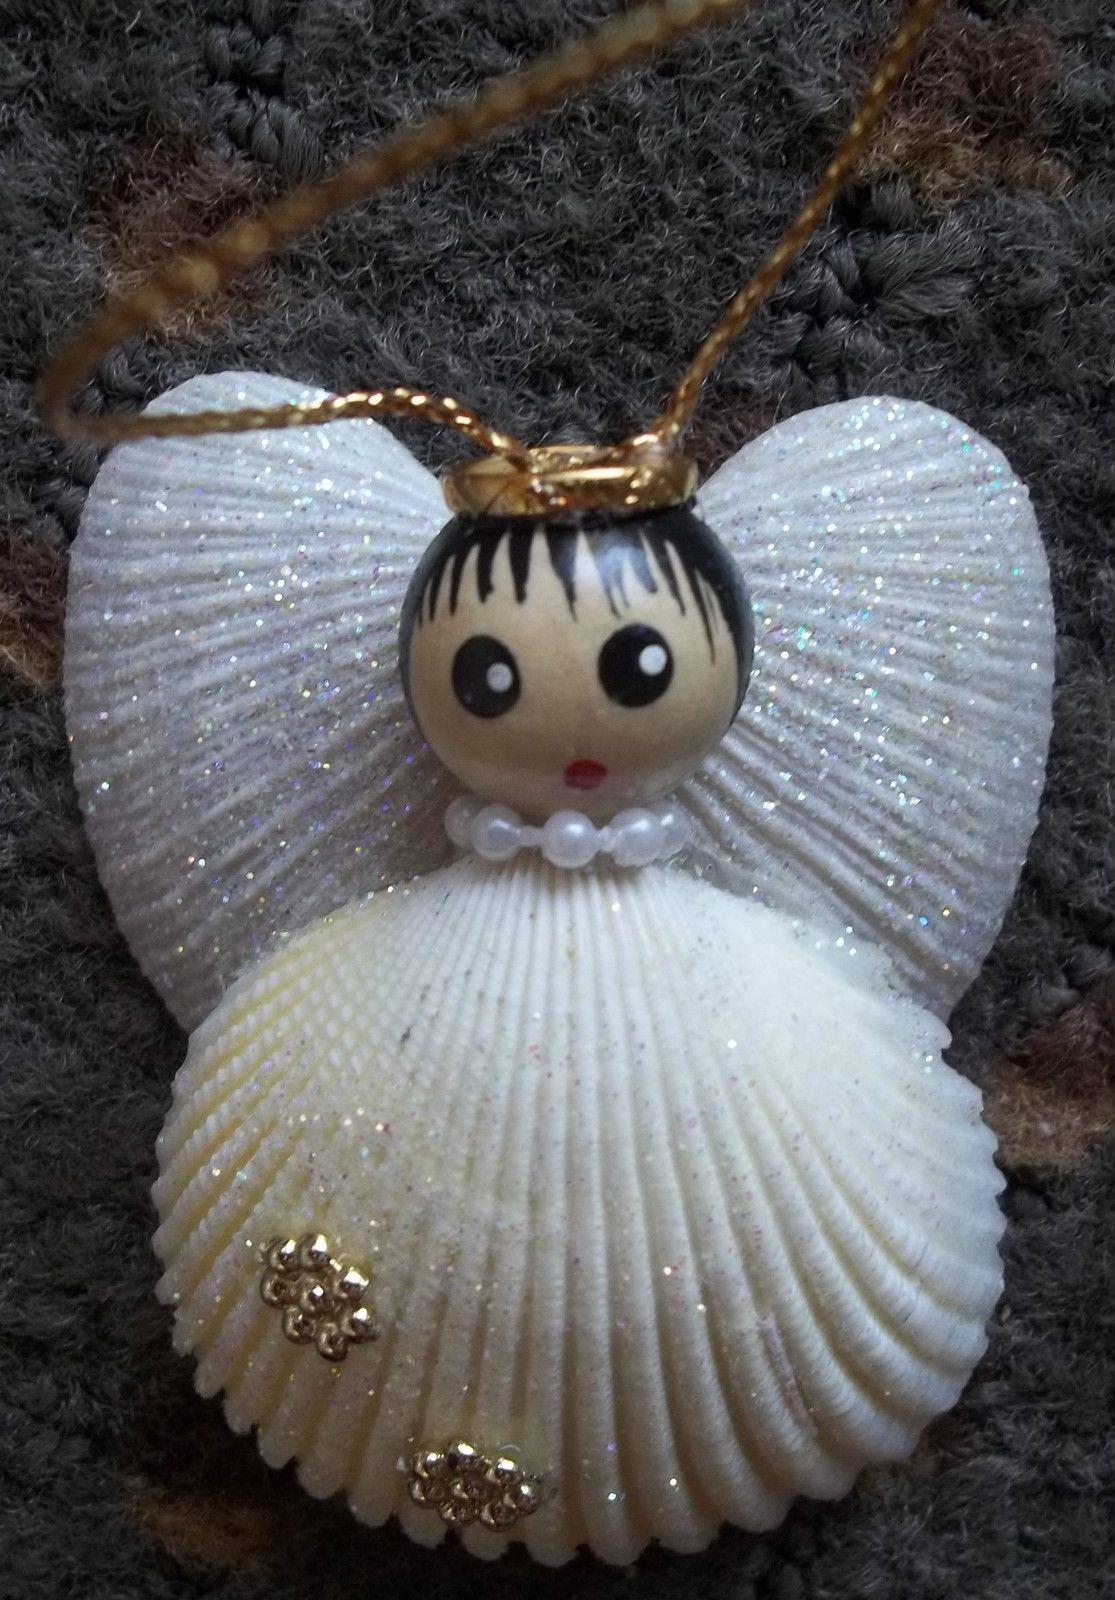 Nautical Sea Shell Angel Pecten Shell Beach Christmas Ornament Beach Christmas Ornaments Handmade Angels Christmas Seashell Crafts